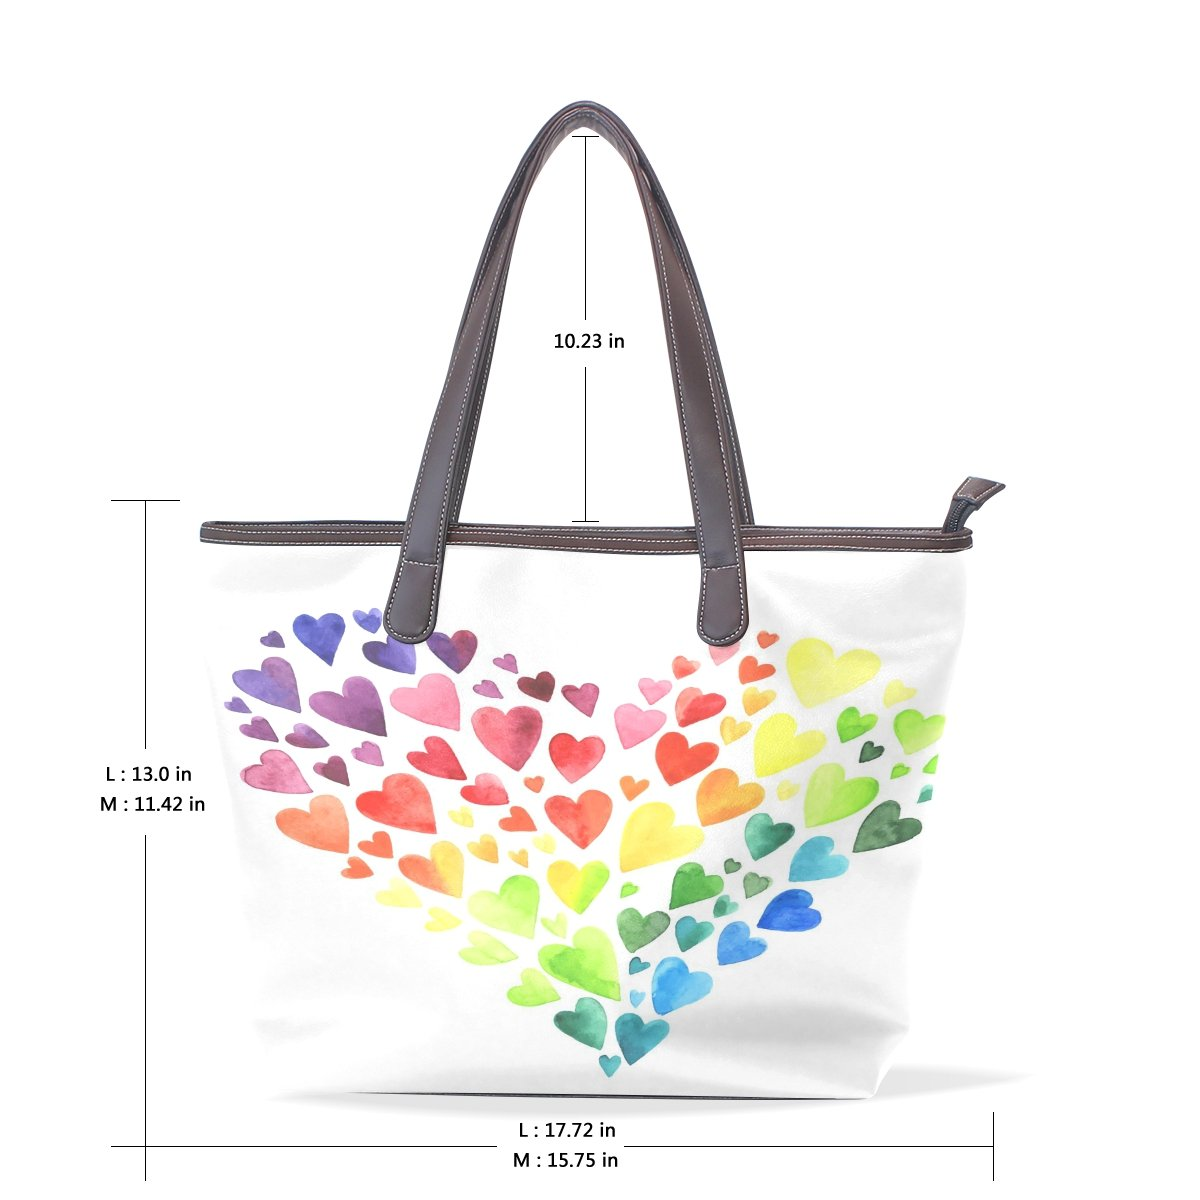 SCDS Watercolor Love PU Leather Lady Handbag Tote Bag Zipper Shoulder Bag